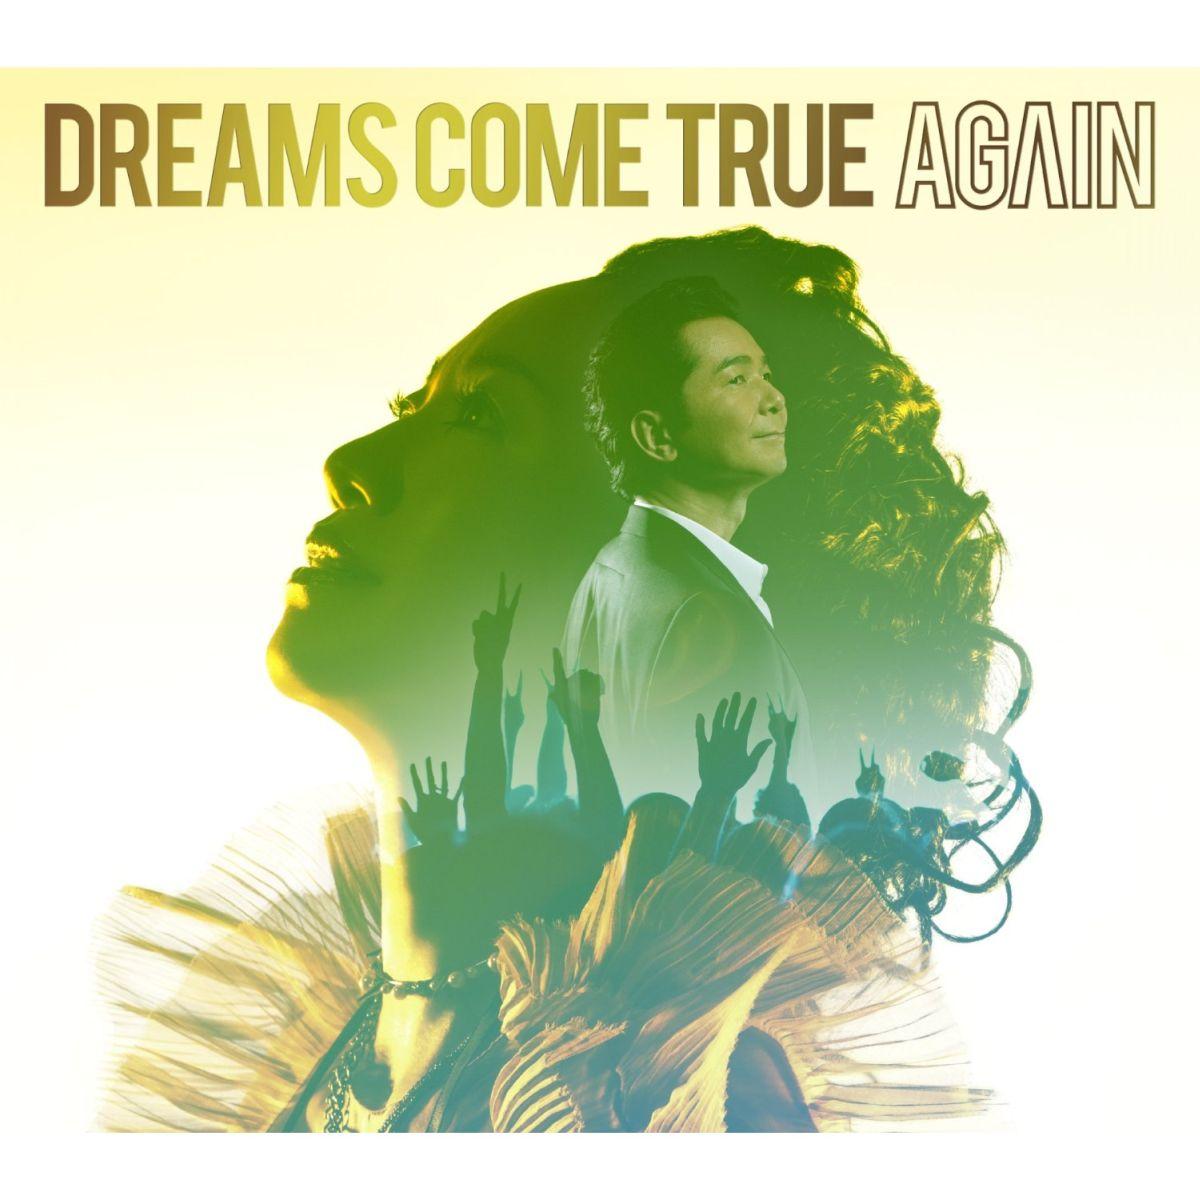 AGAIN(初回限定盤 CD+DVD) [ DREAMS COME TRUE ]